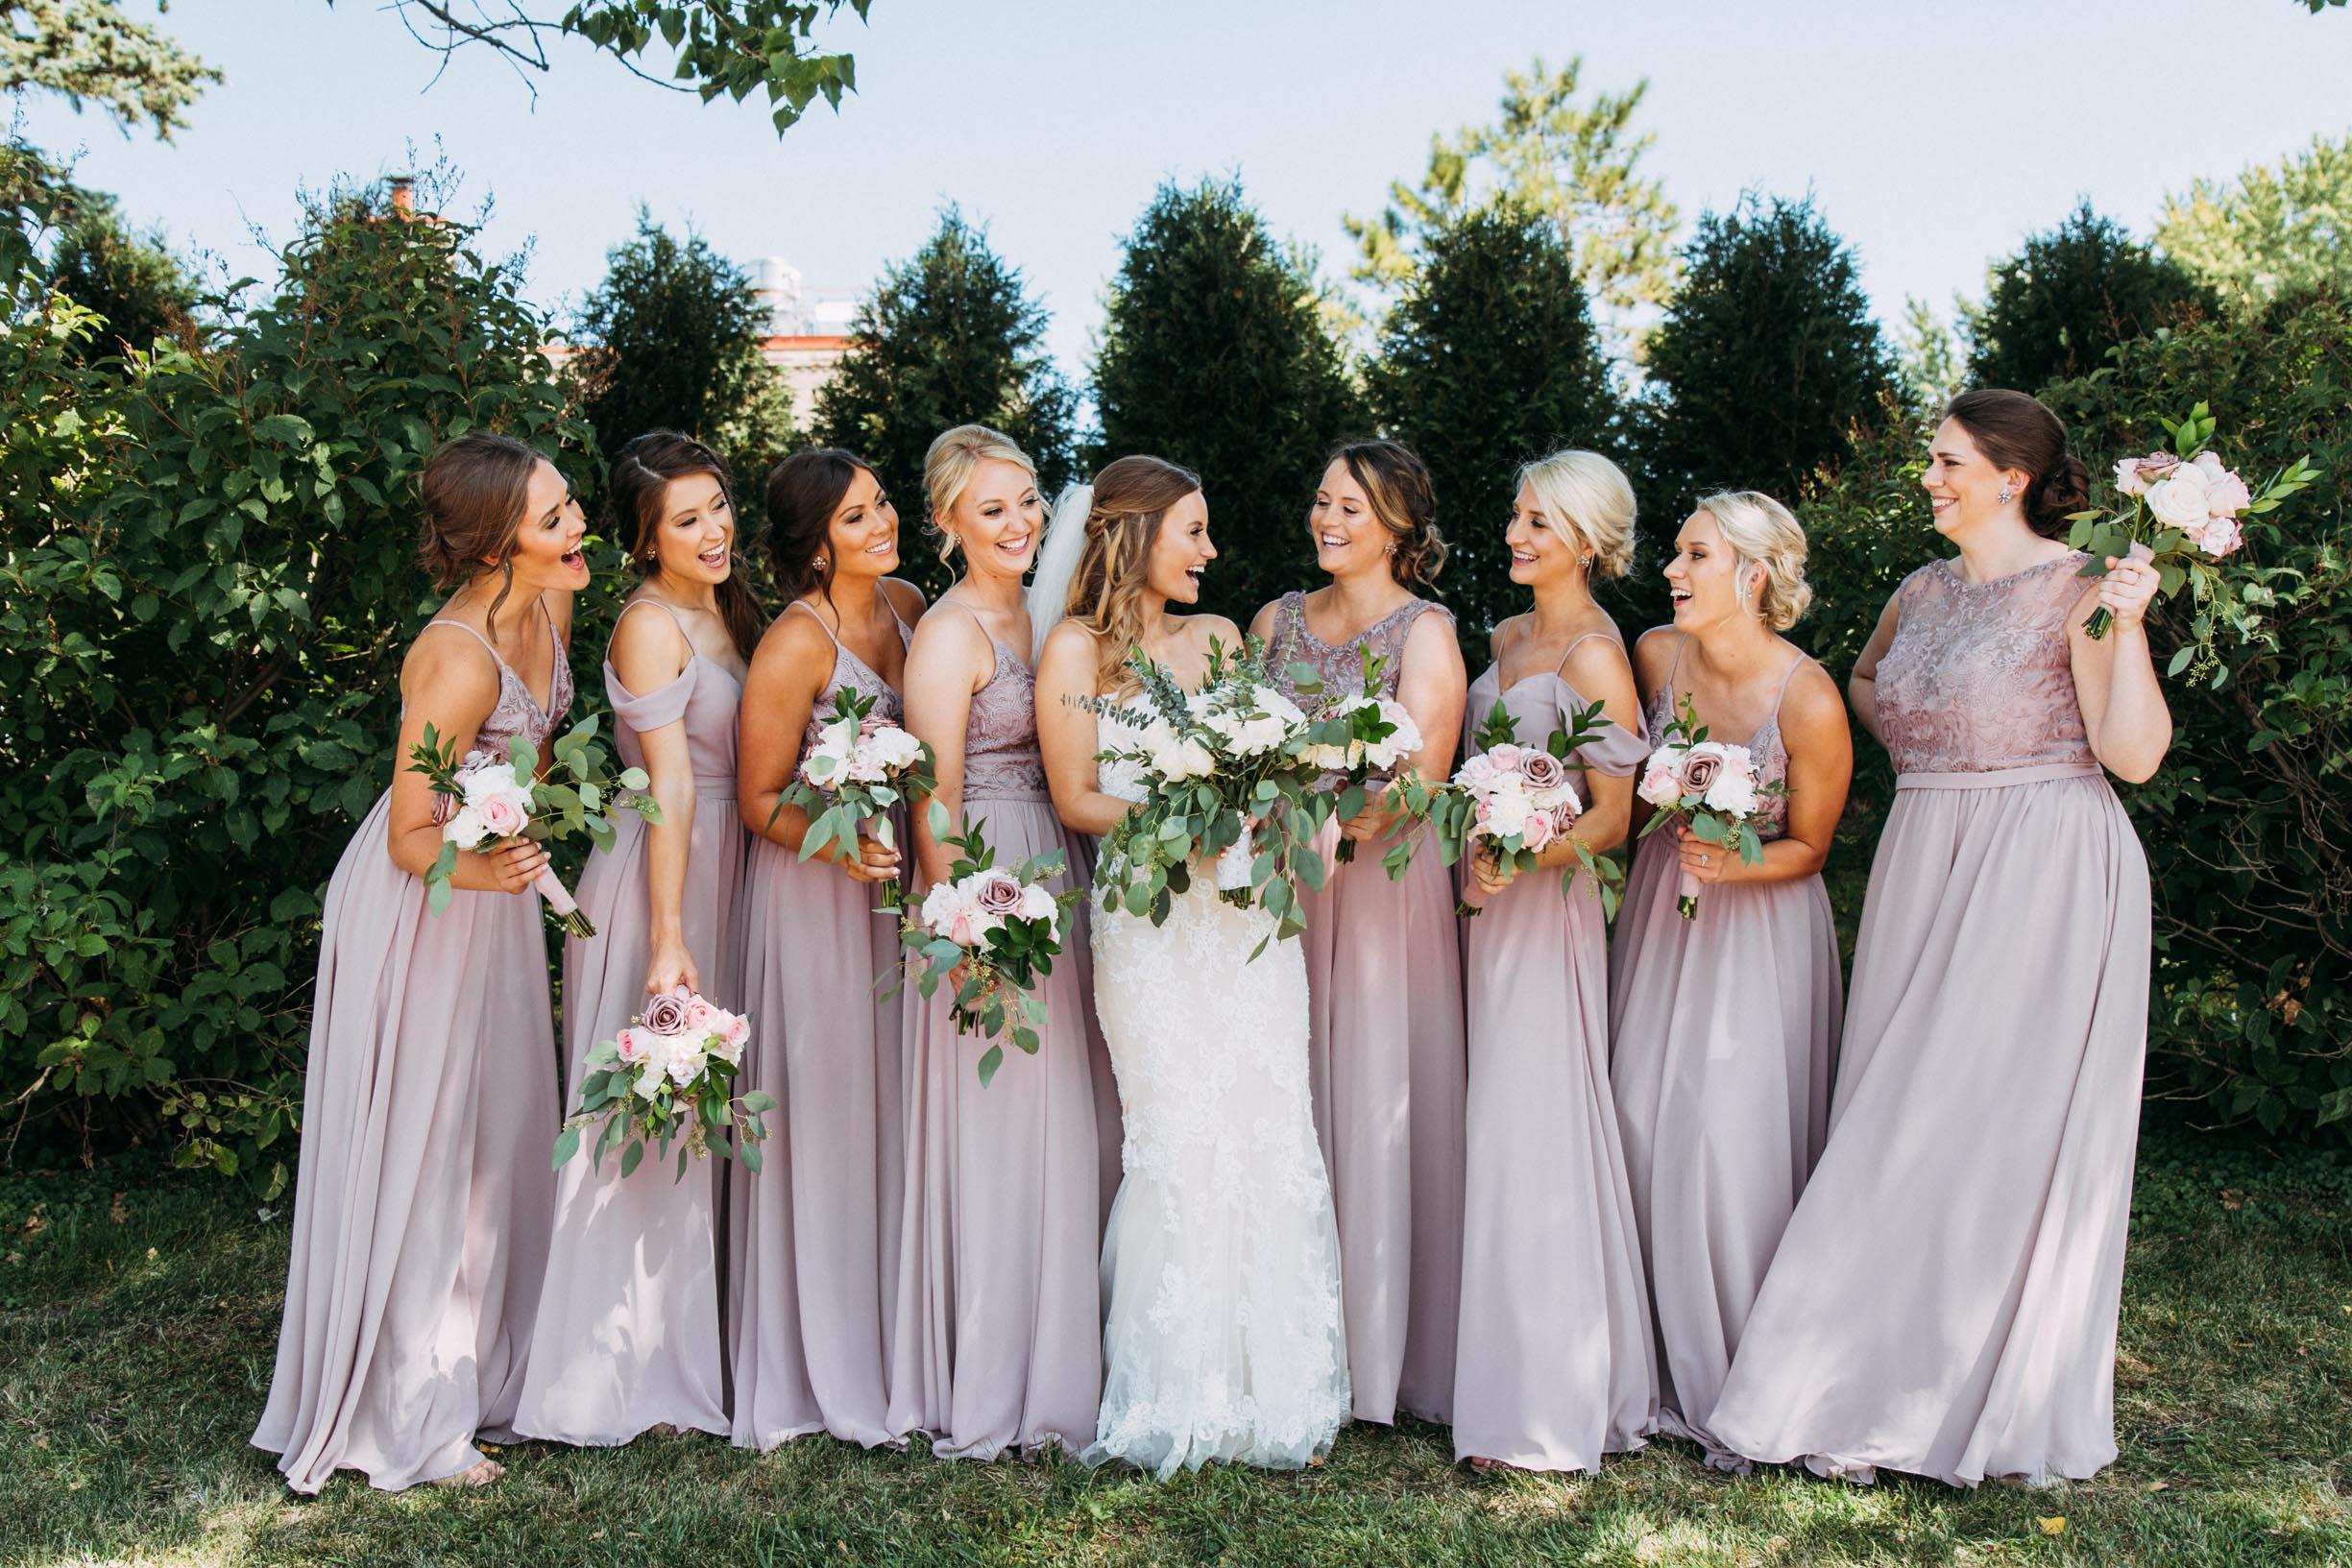 33-WeddingsattheBroz_Minnesota_WeddingBlog_WeddingParty.jpg